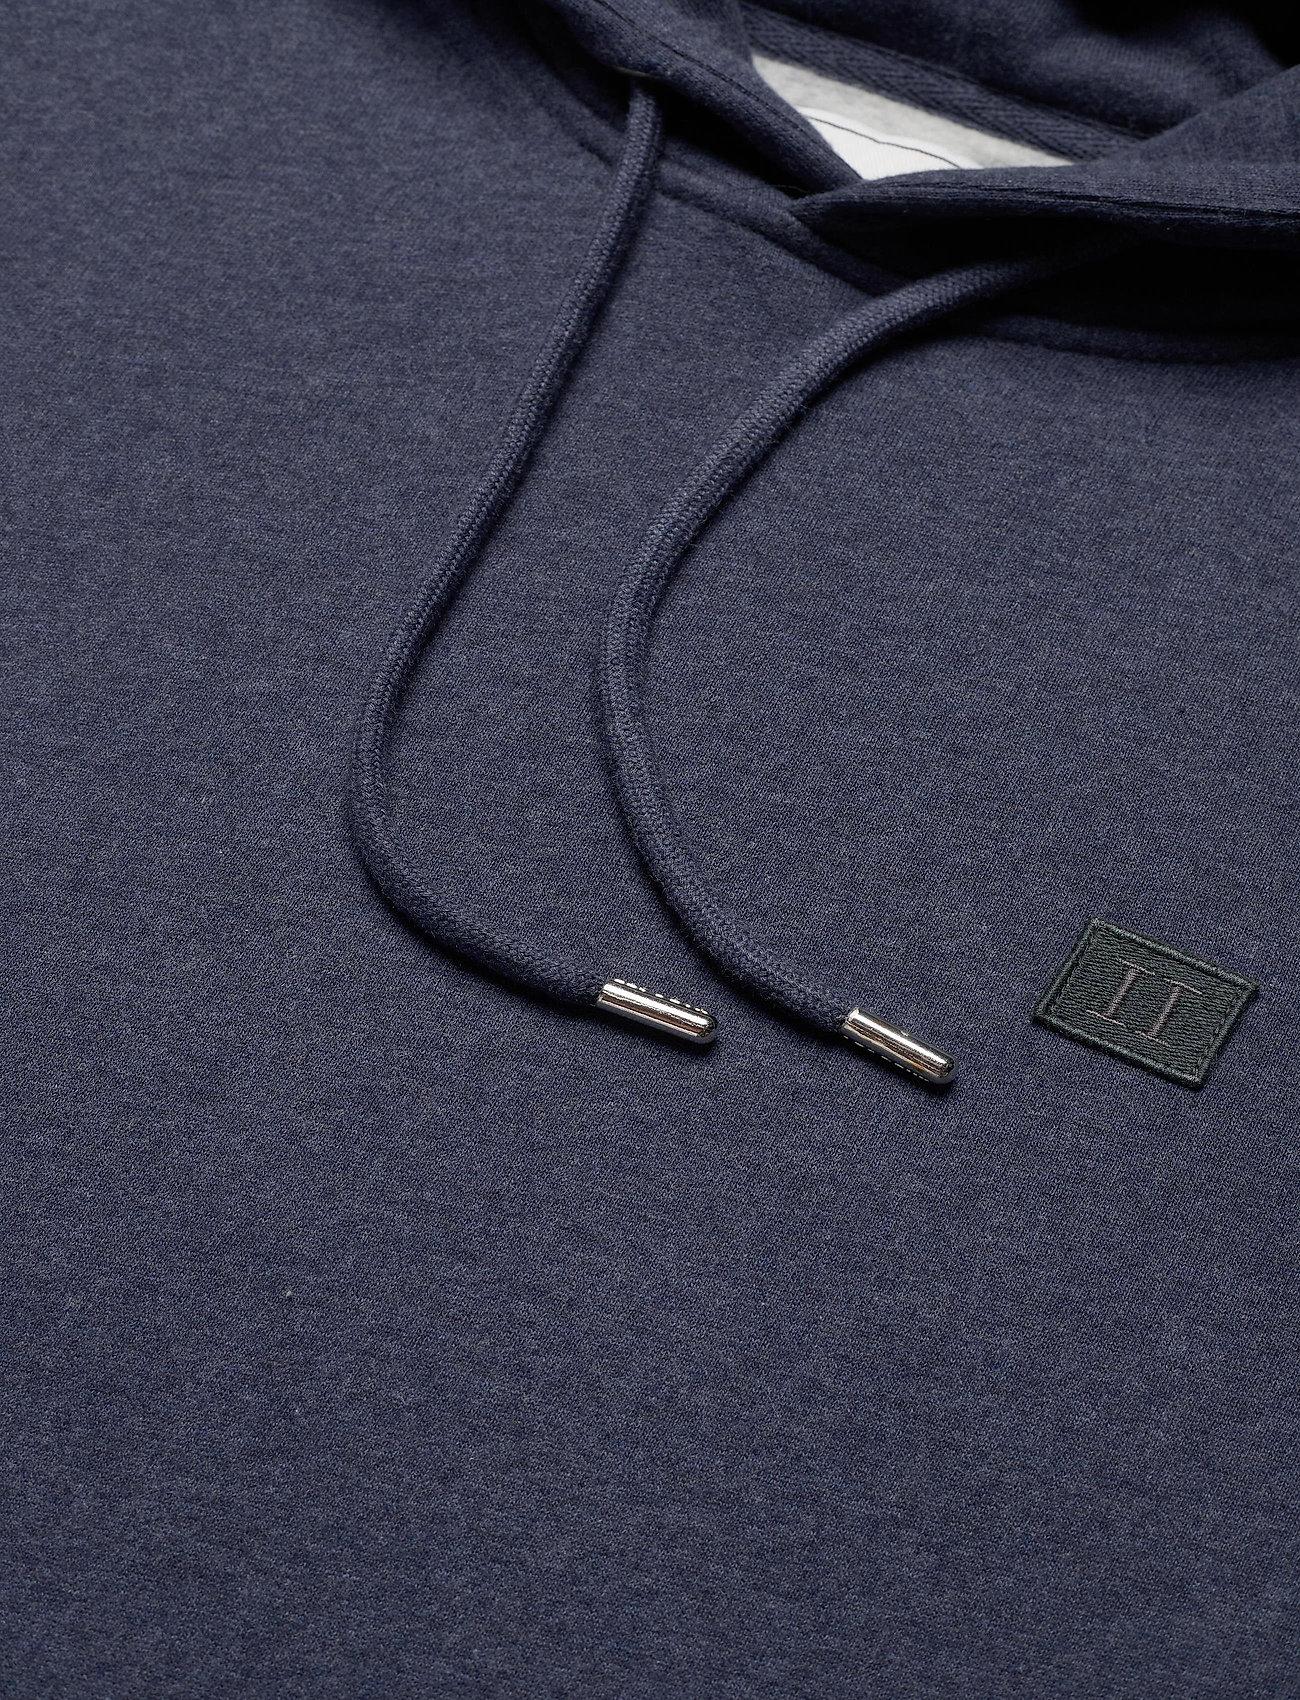 Les Deux Piece Hoodie - Sweatshirts ROYAL BLUE MELANGE/BLUE FOG-CHARCOAL - Menn Klær